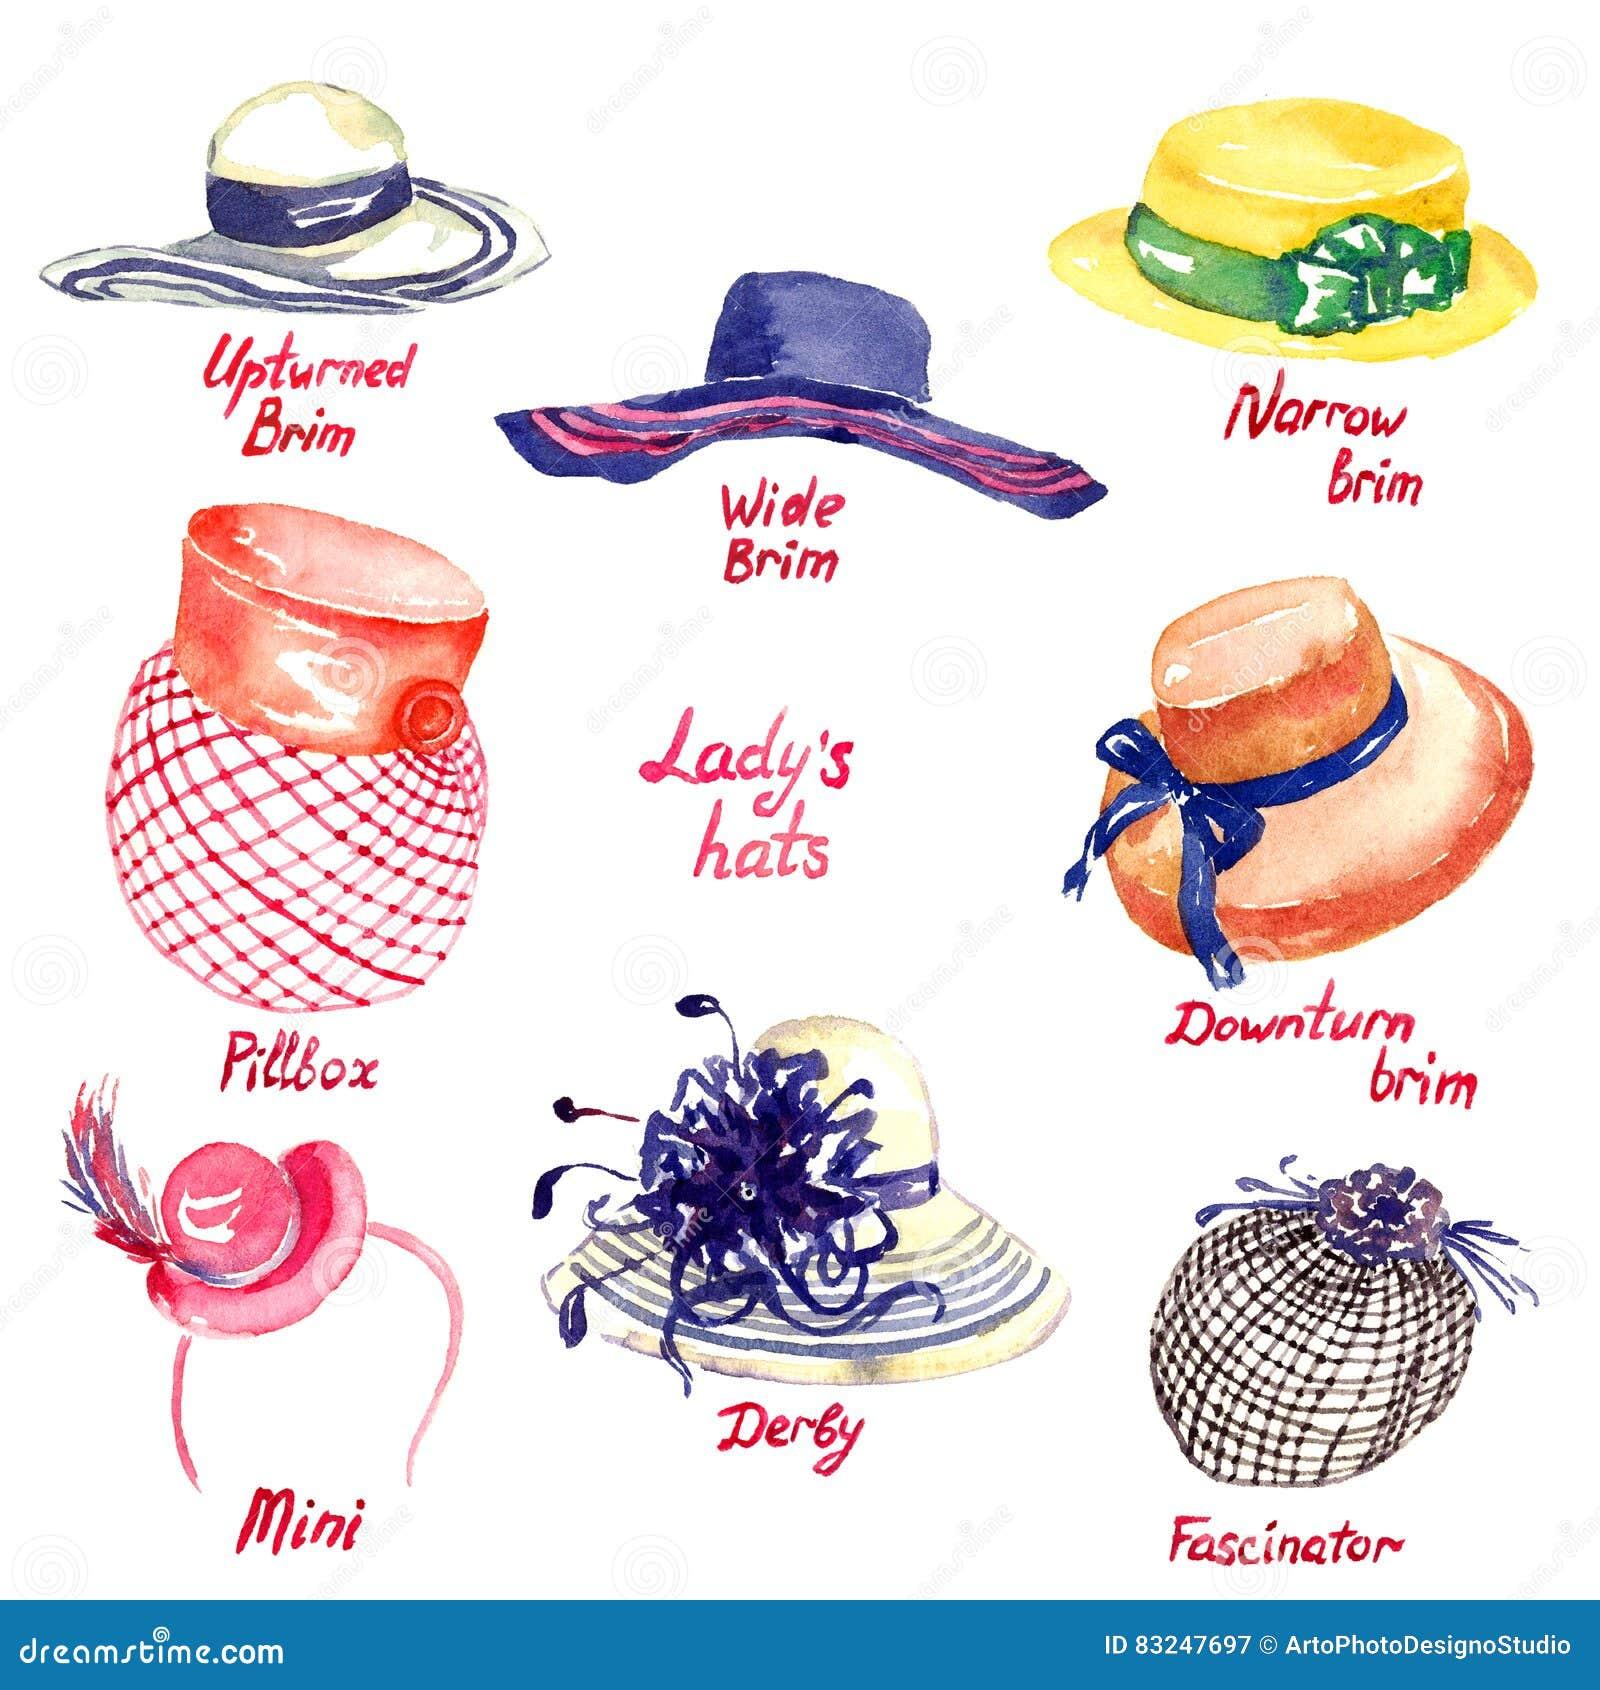 7895e82c3fad0 Derby Hats Stock Illustrations – 116 Derby Hats Stock Illustrations ...